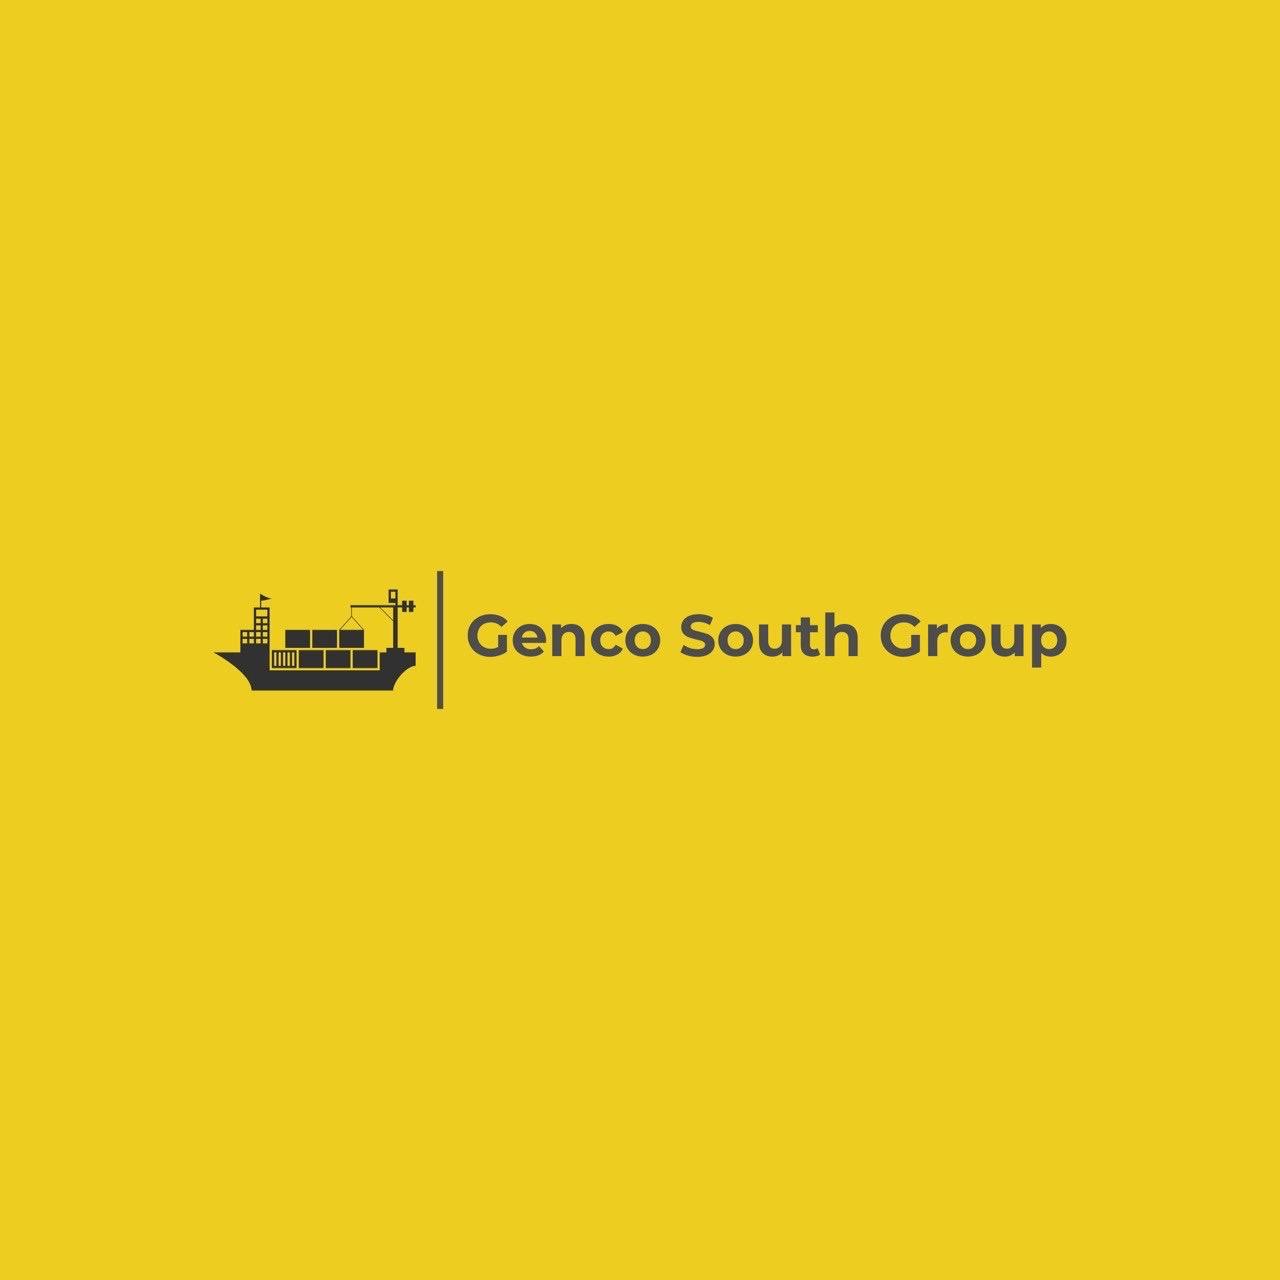 Genco South Group